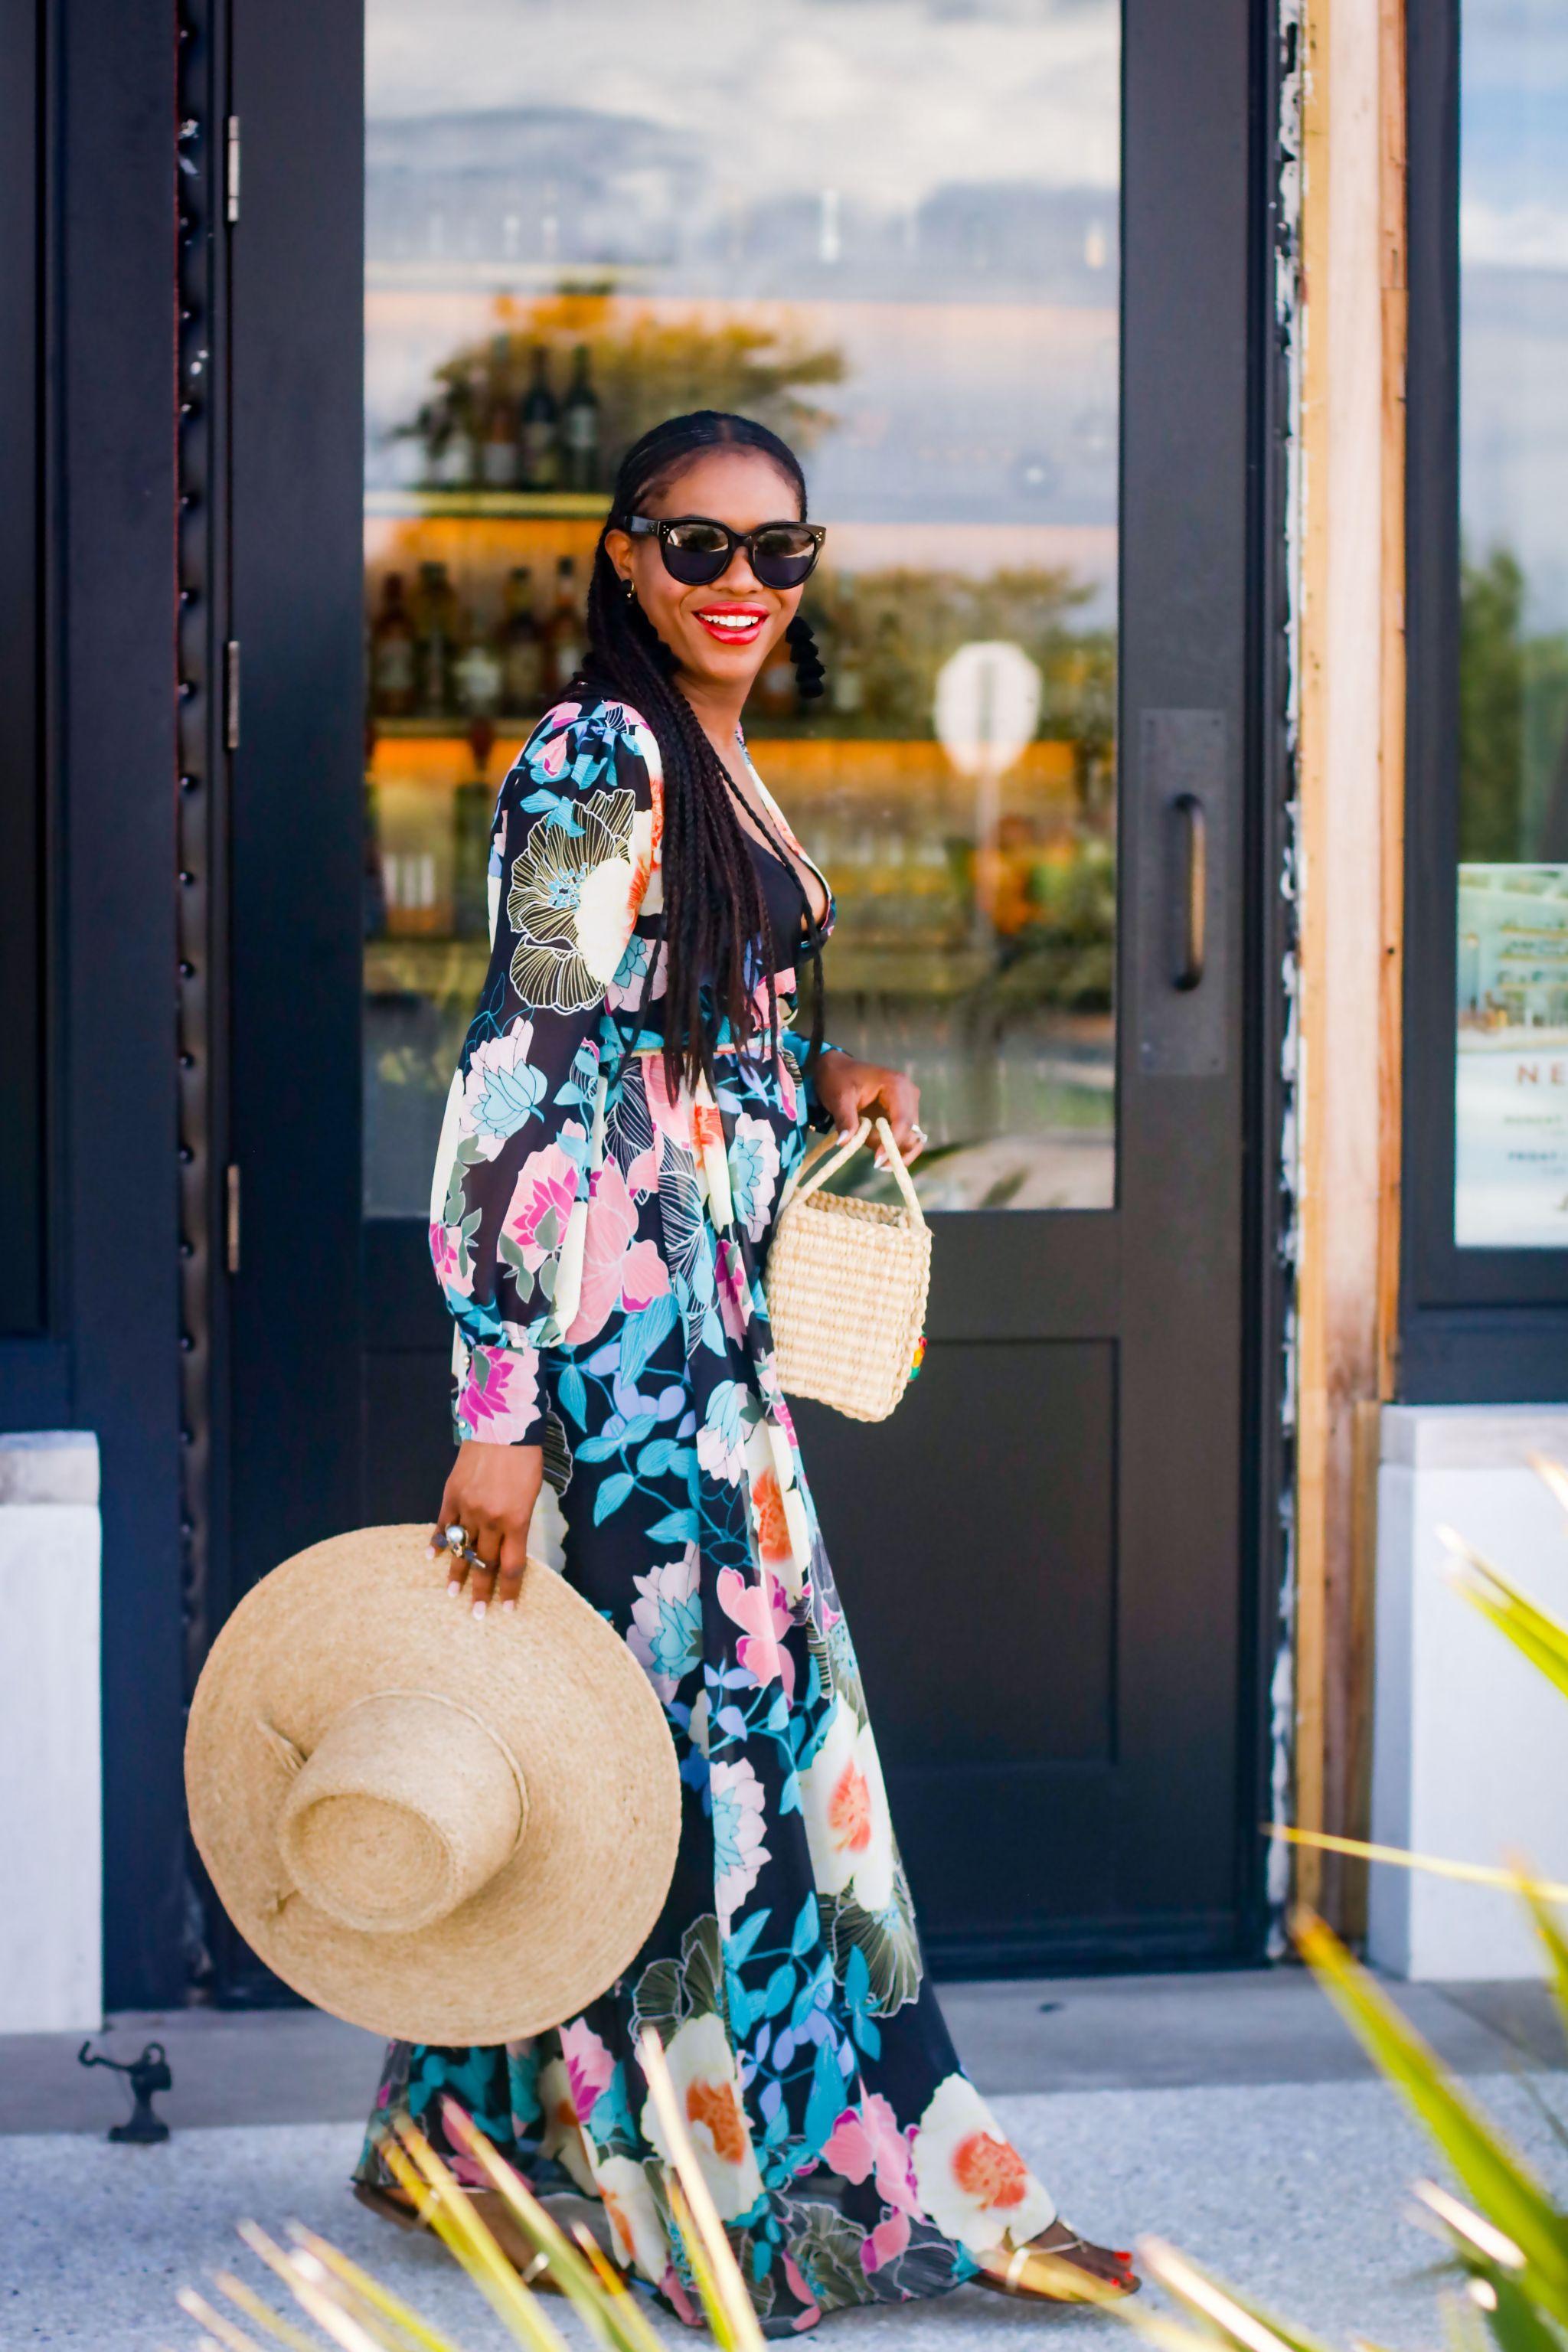 Fashion blogger wearing Maxi dress to the beach.jpg 6